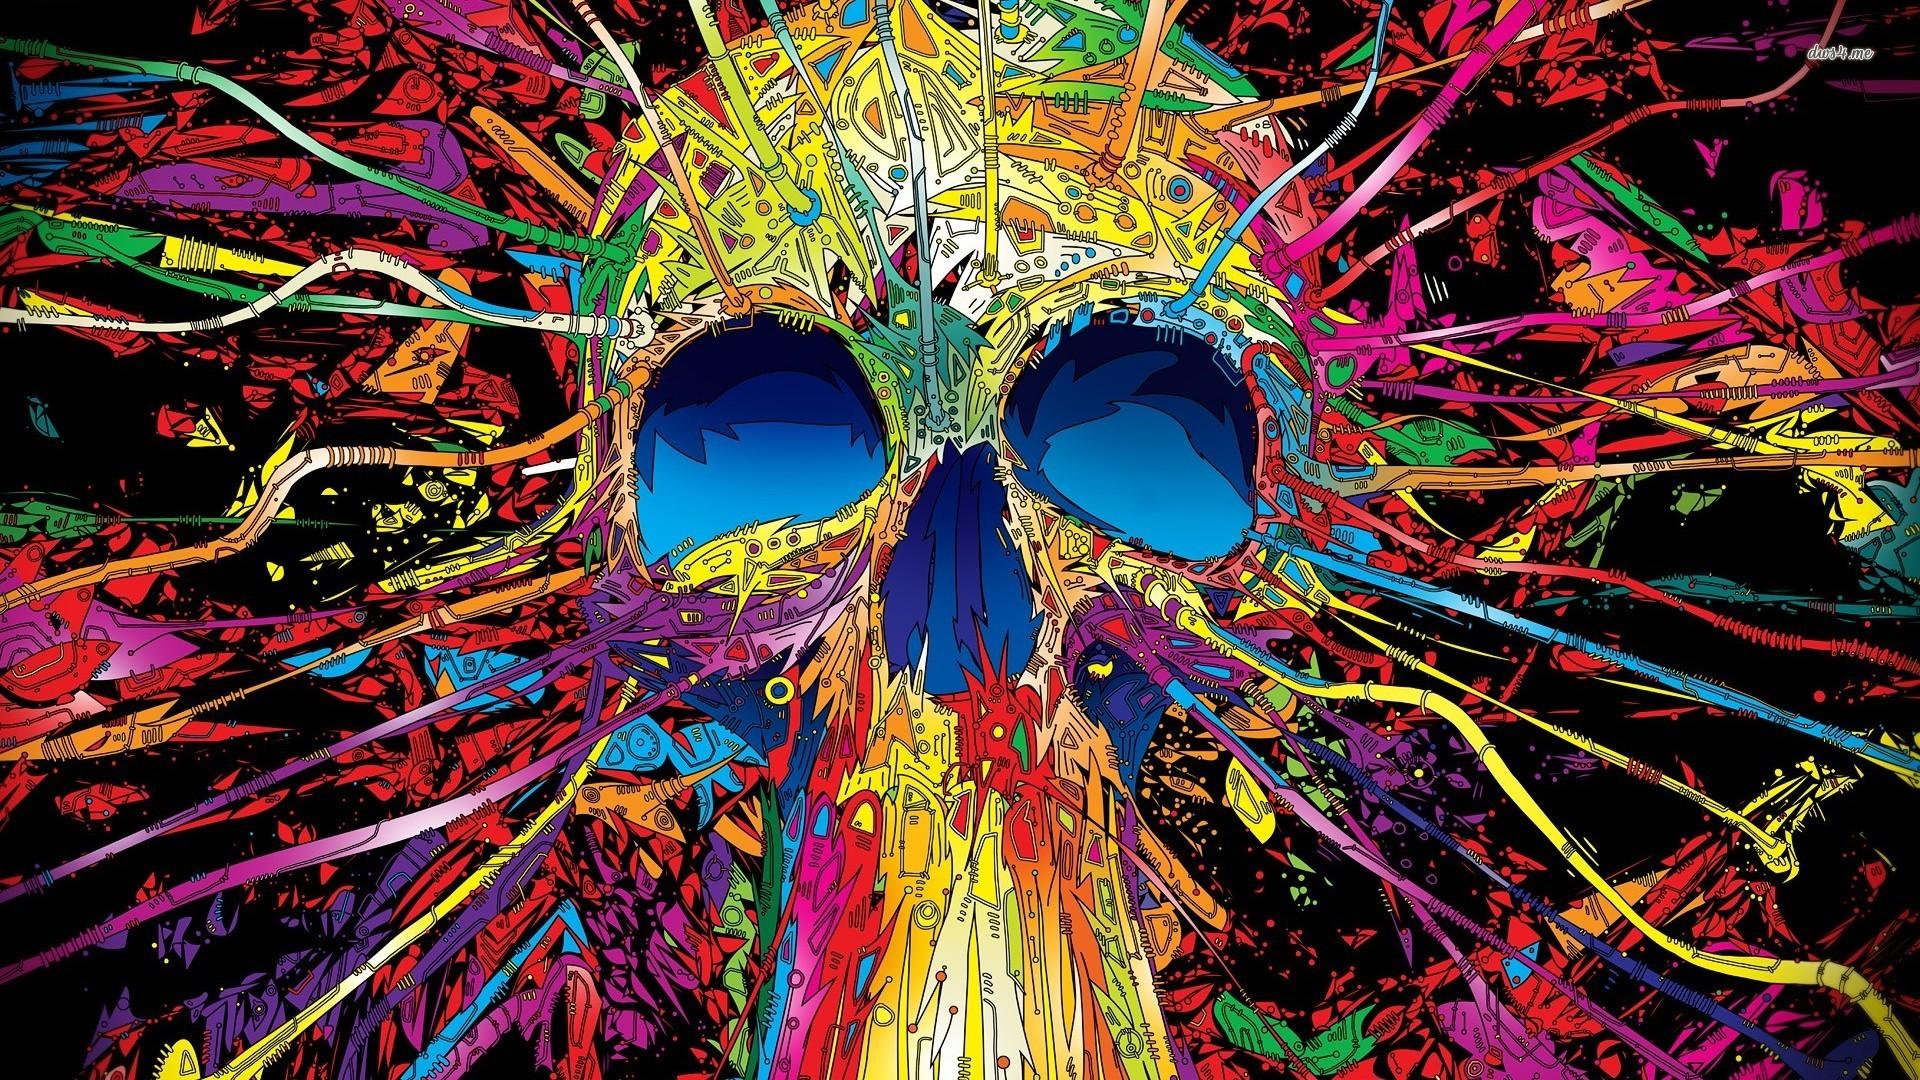 Explore Sugar Skull Wallpaper, Weed Wallpaper, and more!